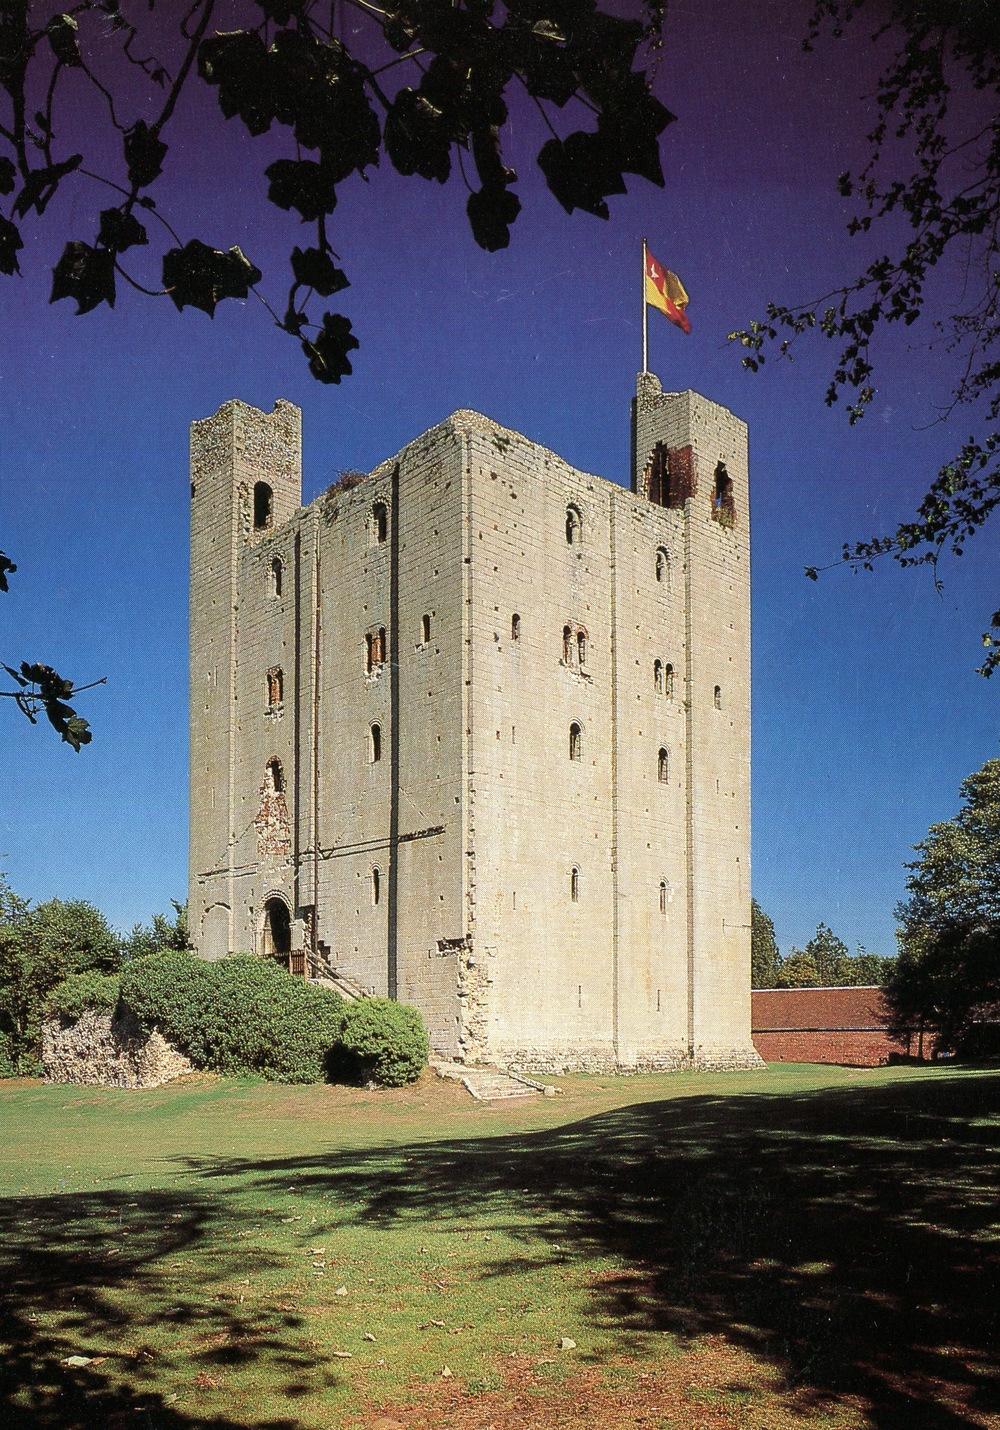 Hedingham Castle, England